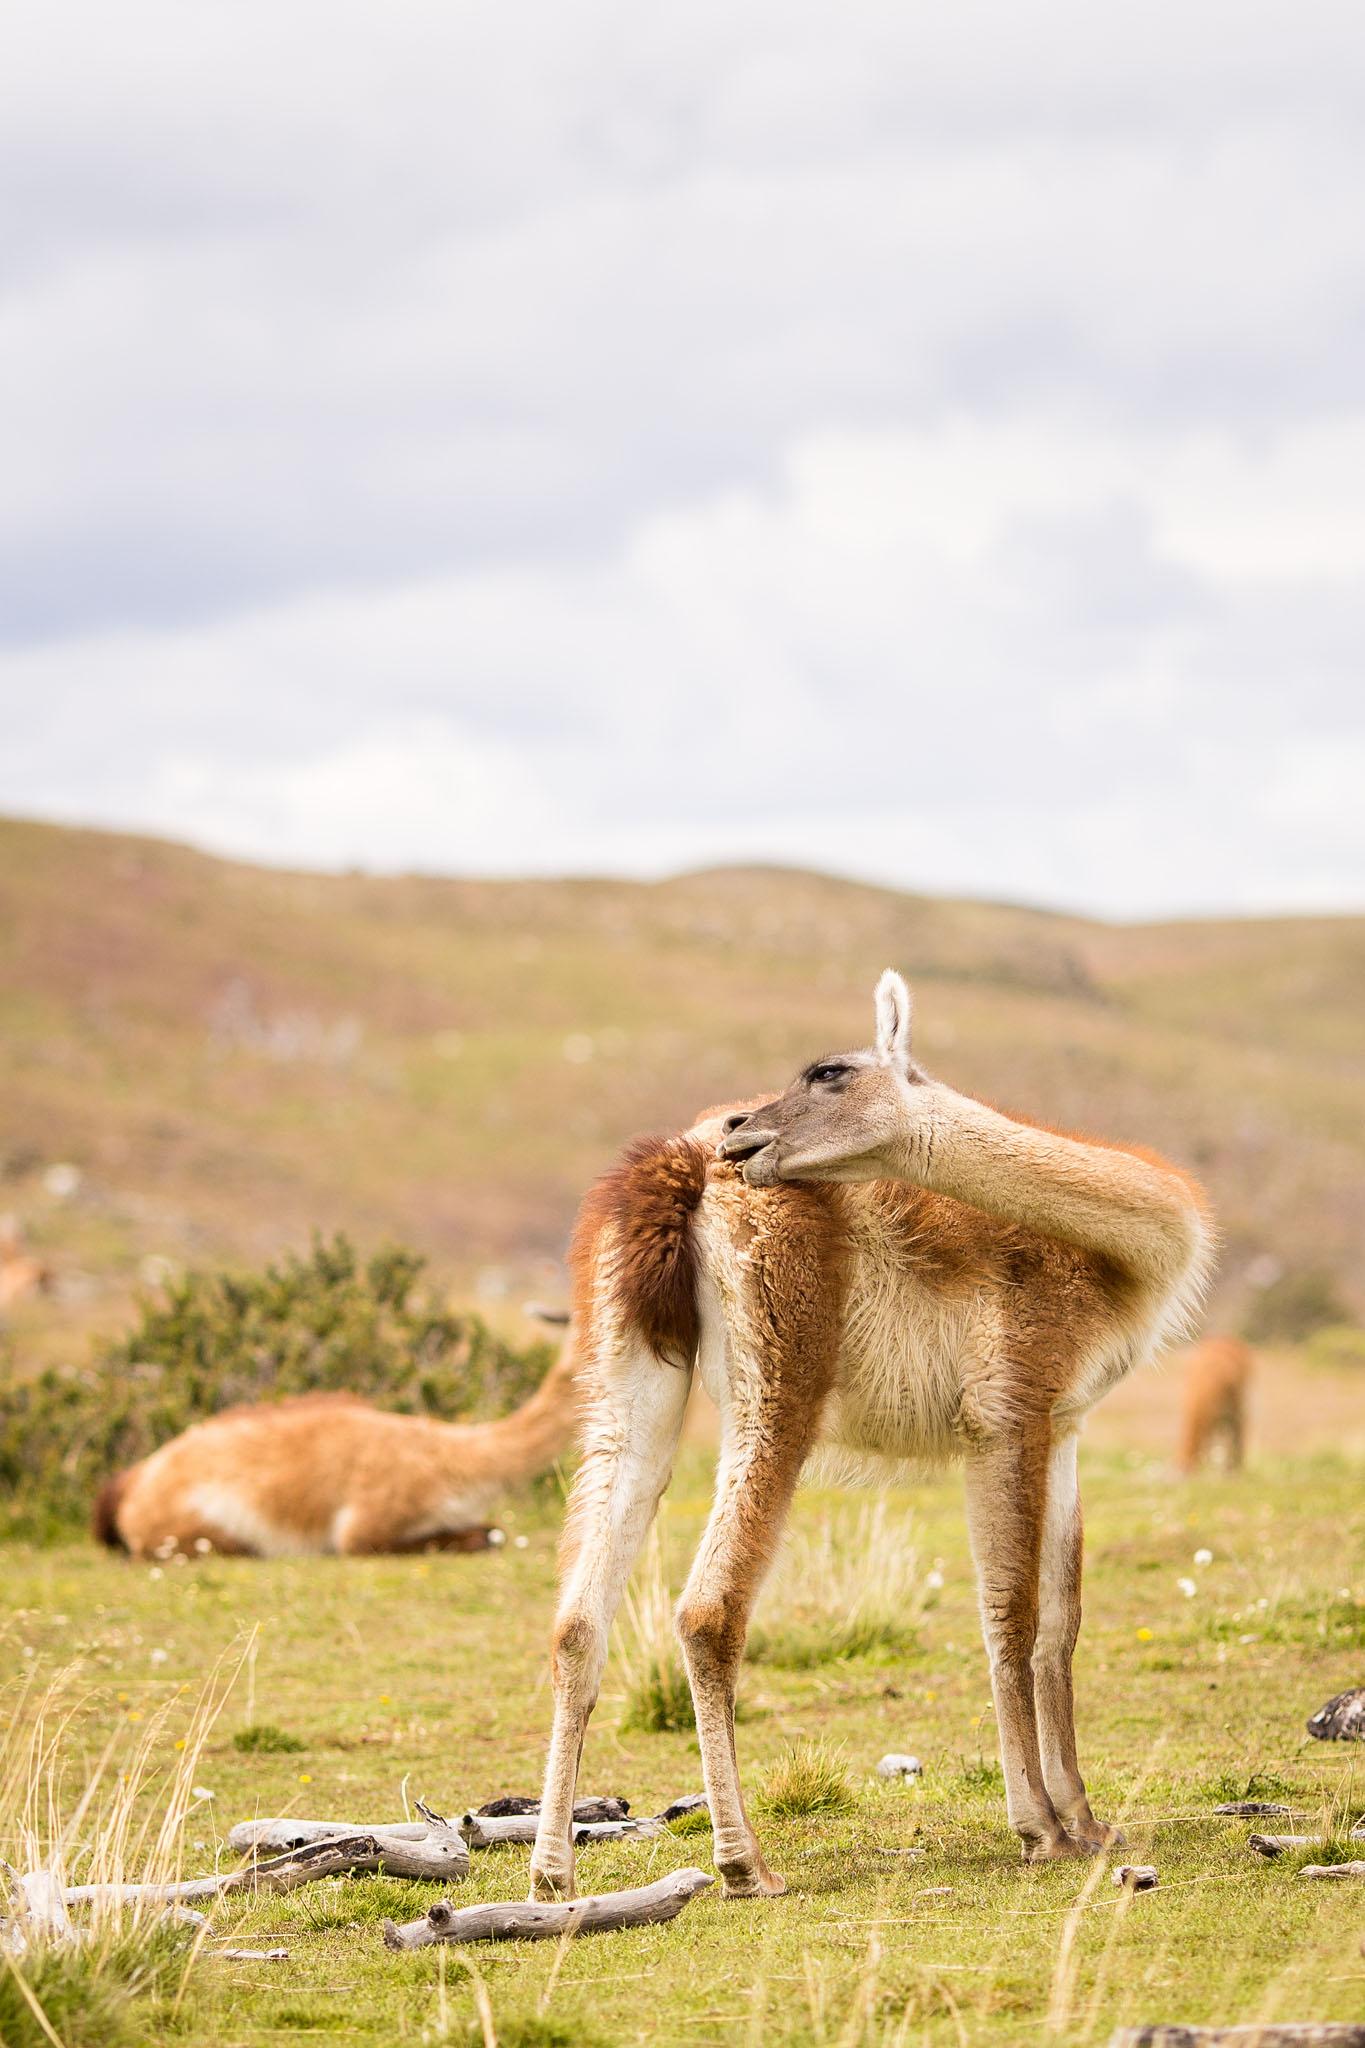 Wedding-Travellers-Overlanding-Destination-Wedding-Chile-Torres-del-Paine-guanaco-lama-llama-tres-torres-cute-funny